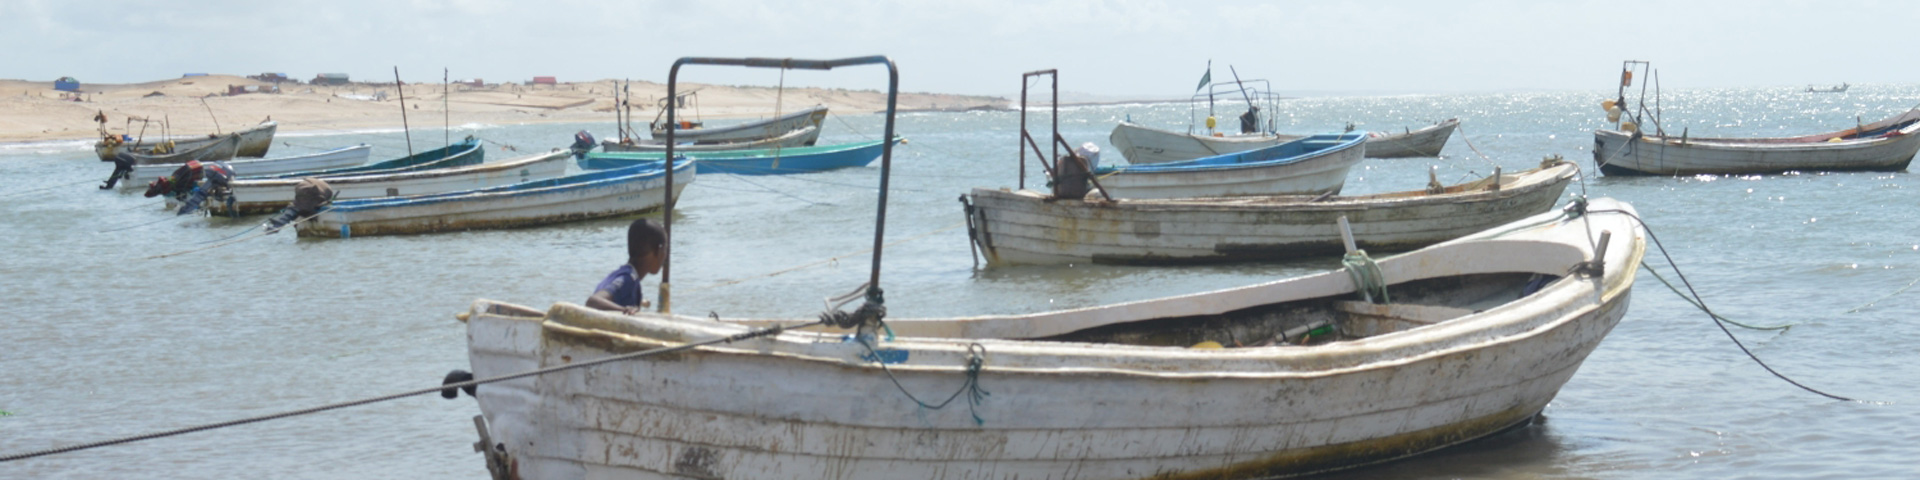 Vissersboten in Somalië